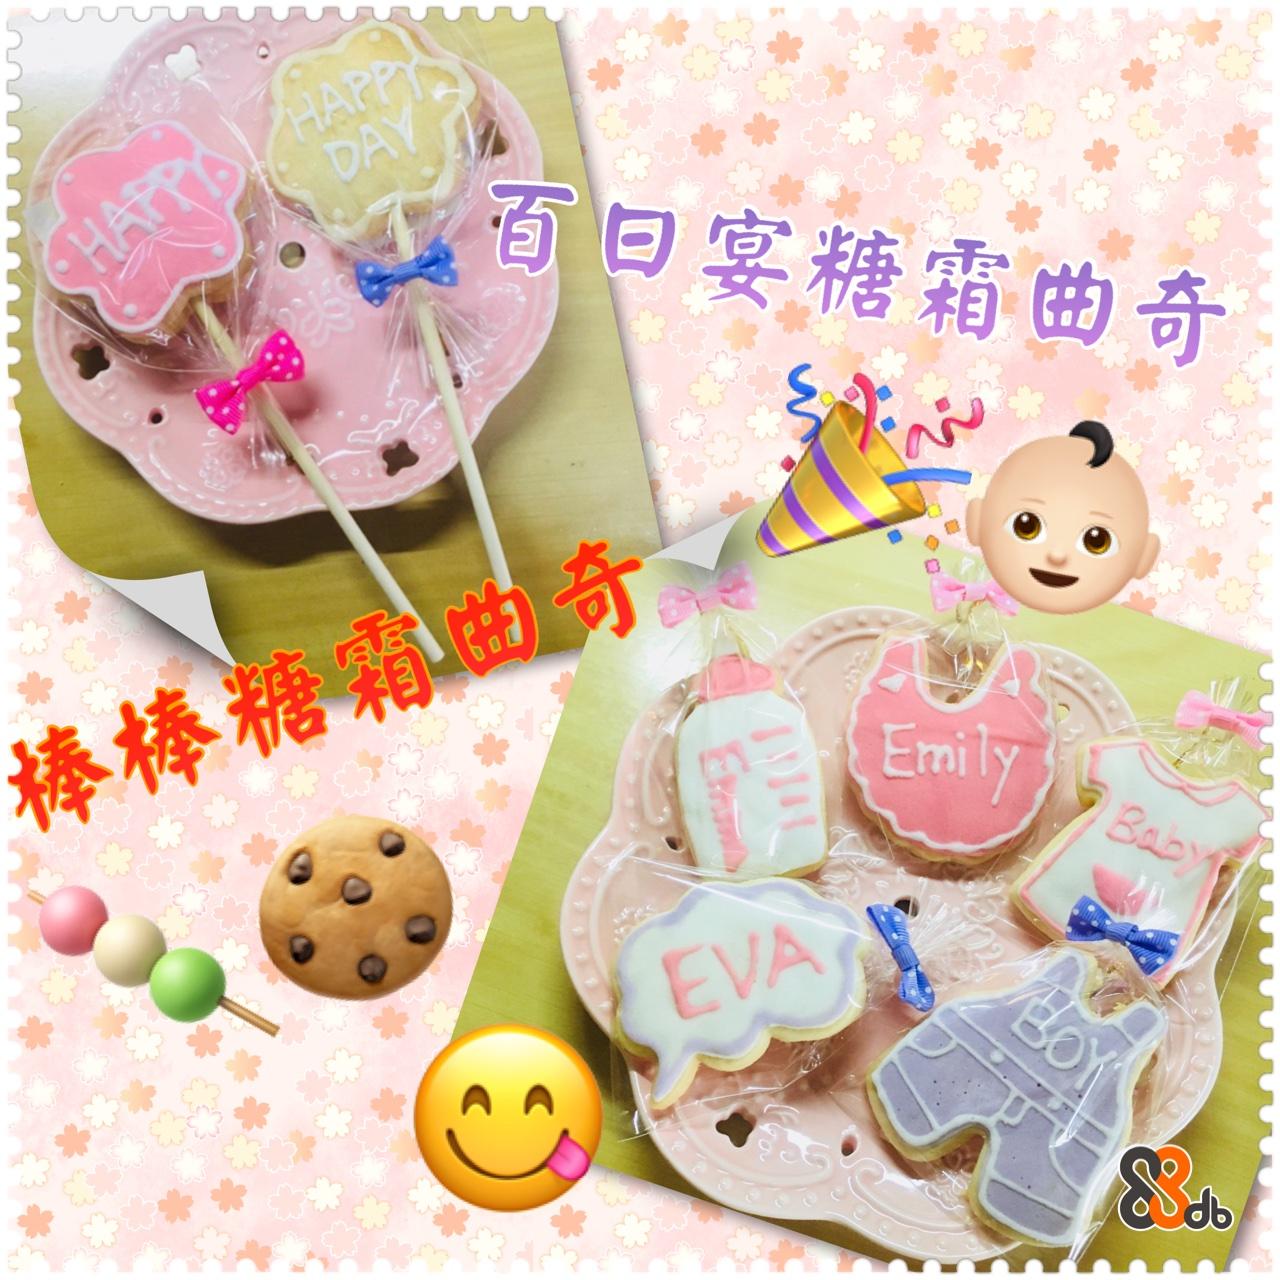 DAY 何 宴糖霜曲奇 Emil EVA db,stuffed toy,product,material,baking,font